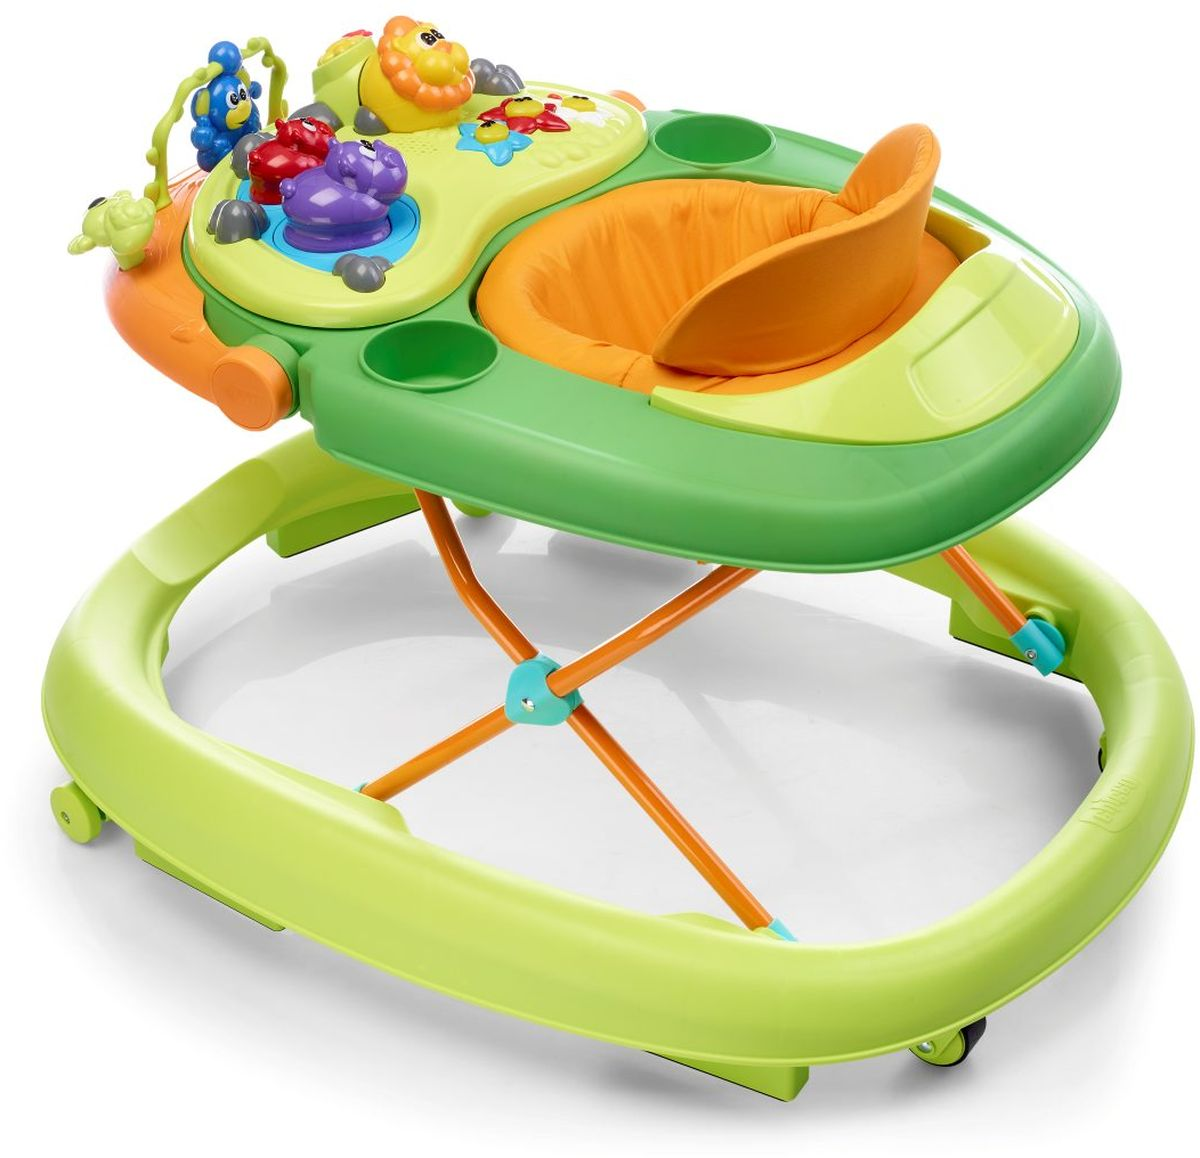 Chicco Ходунки Walky Talky цвет зеленый держатель ходунки для ребенка other 4034 mothercare